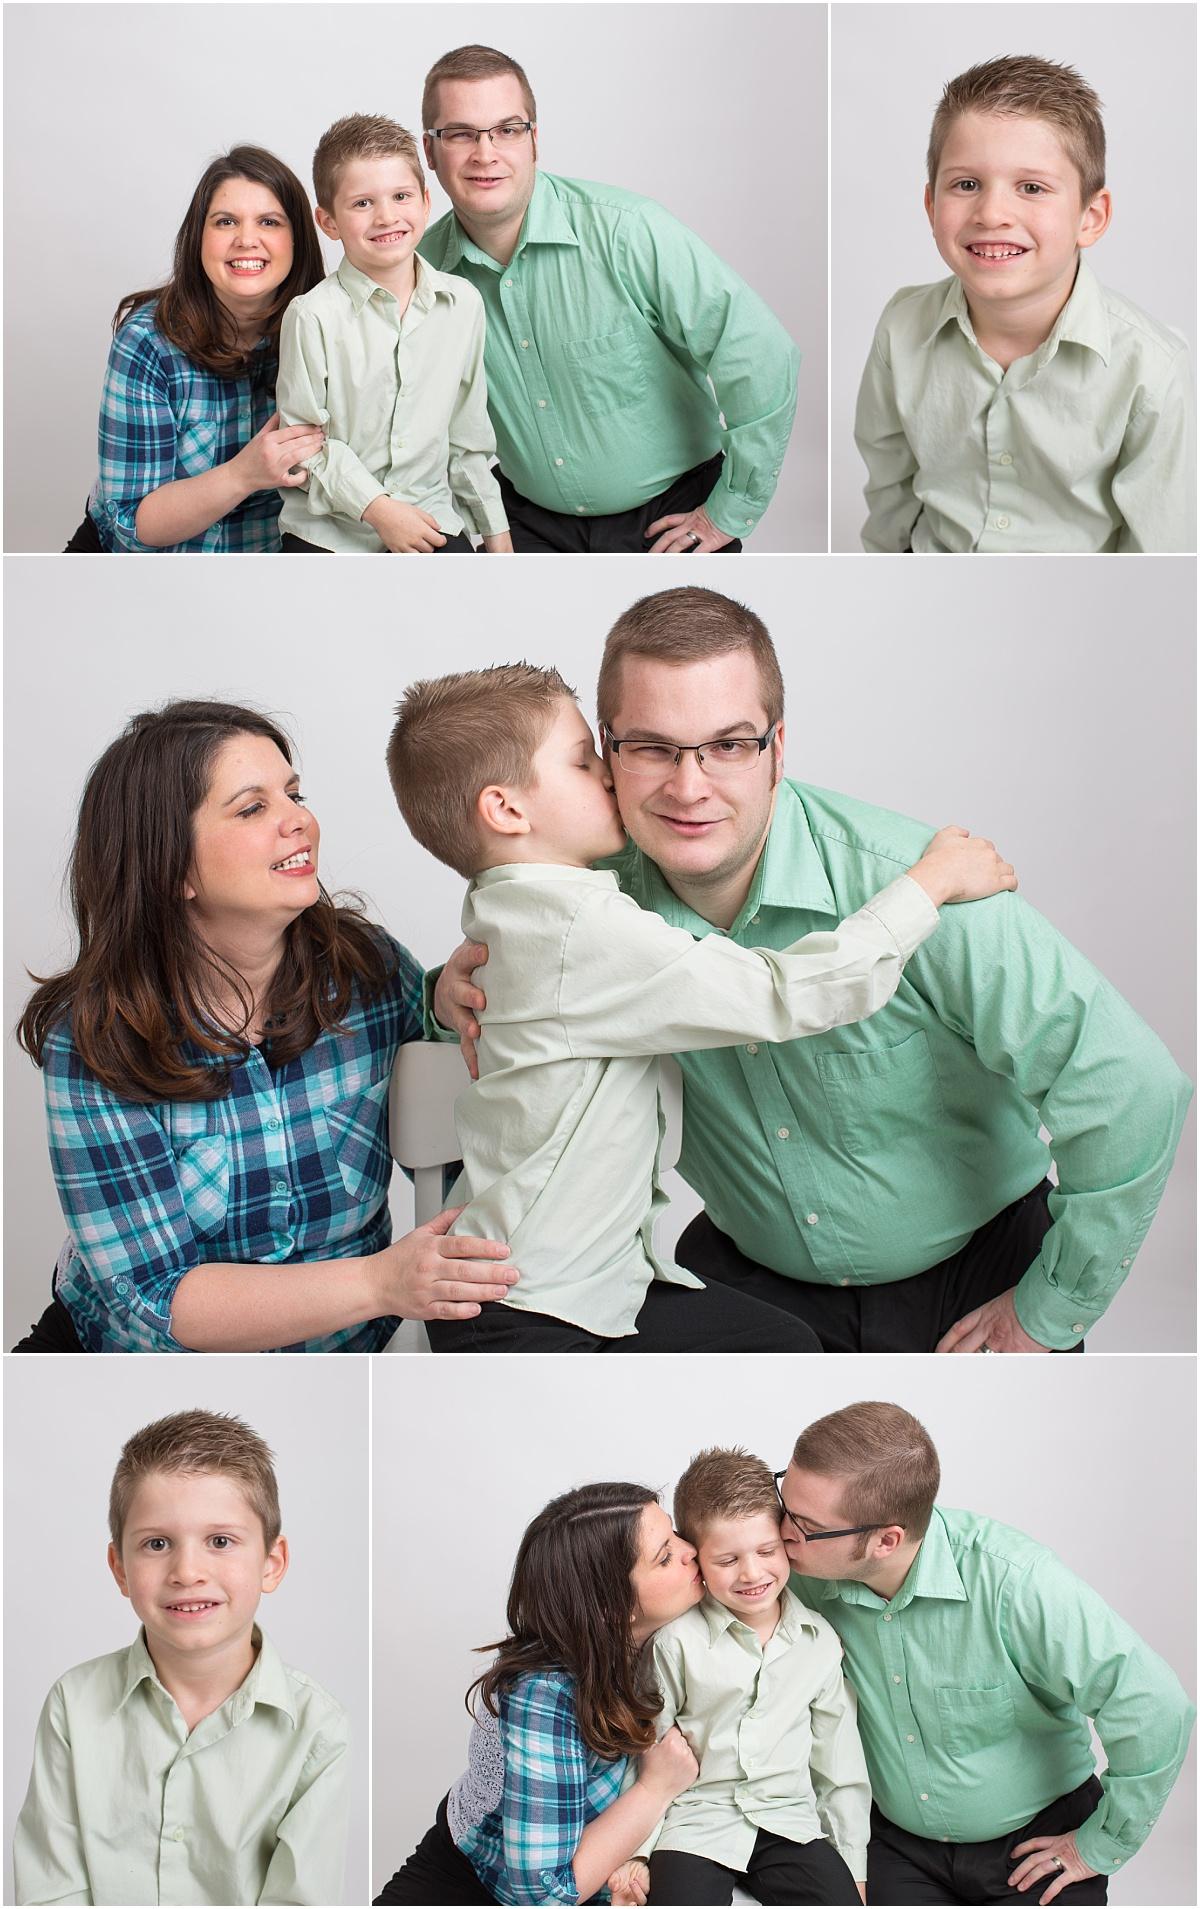 Family photography_Meridian Idaho_Studio Photography_Leah Southwick Photography_0030.jpg